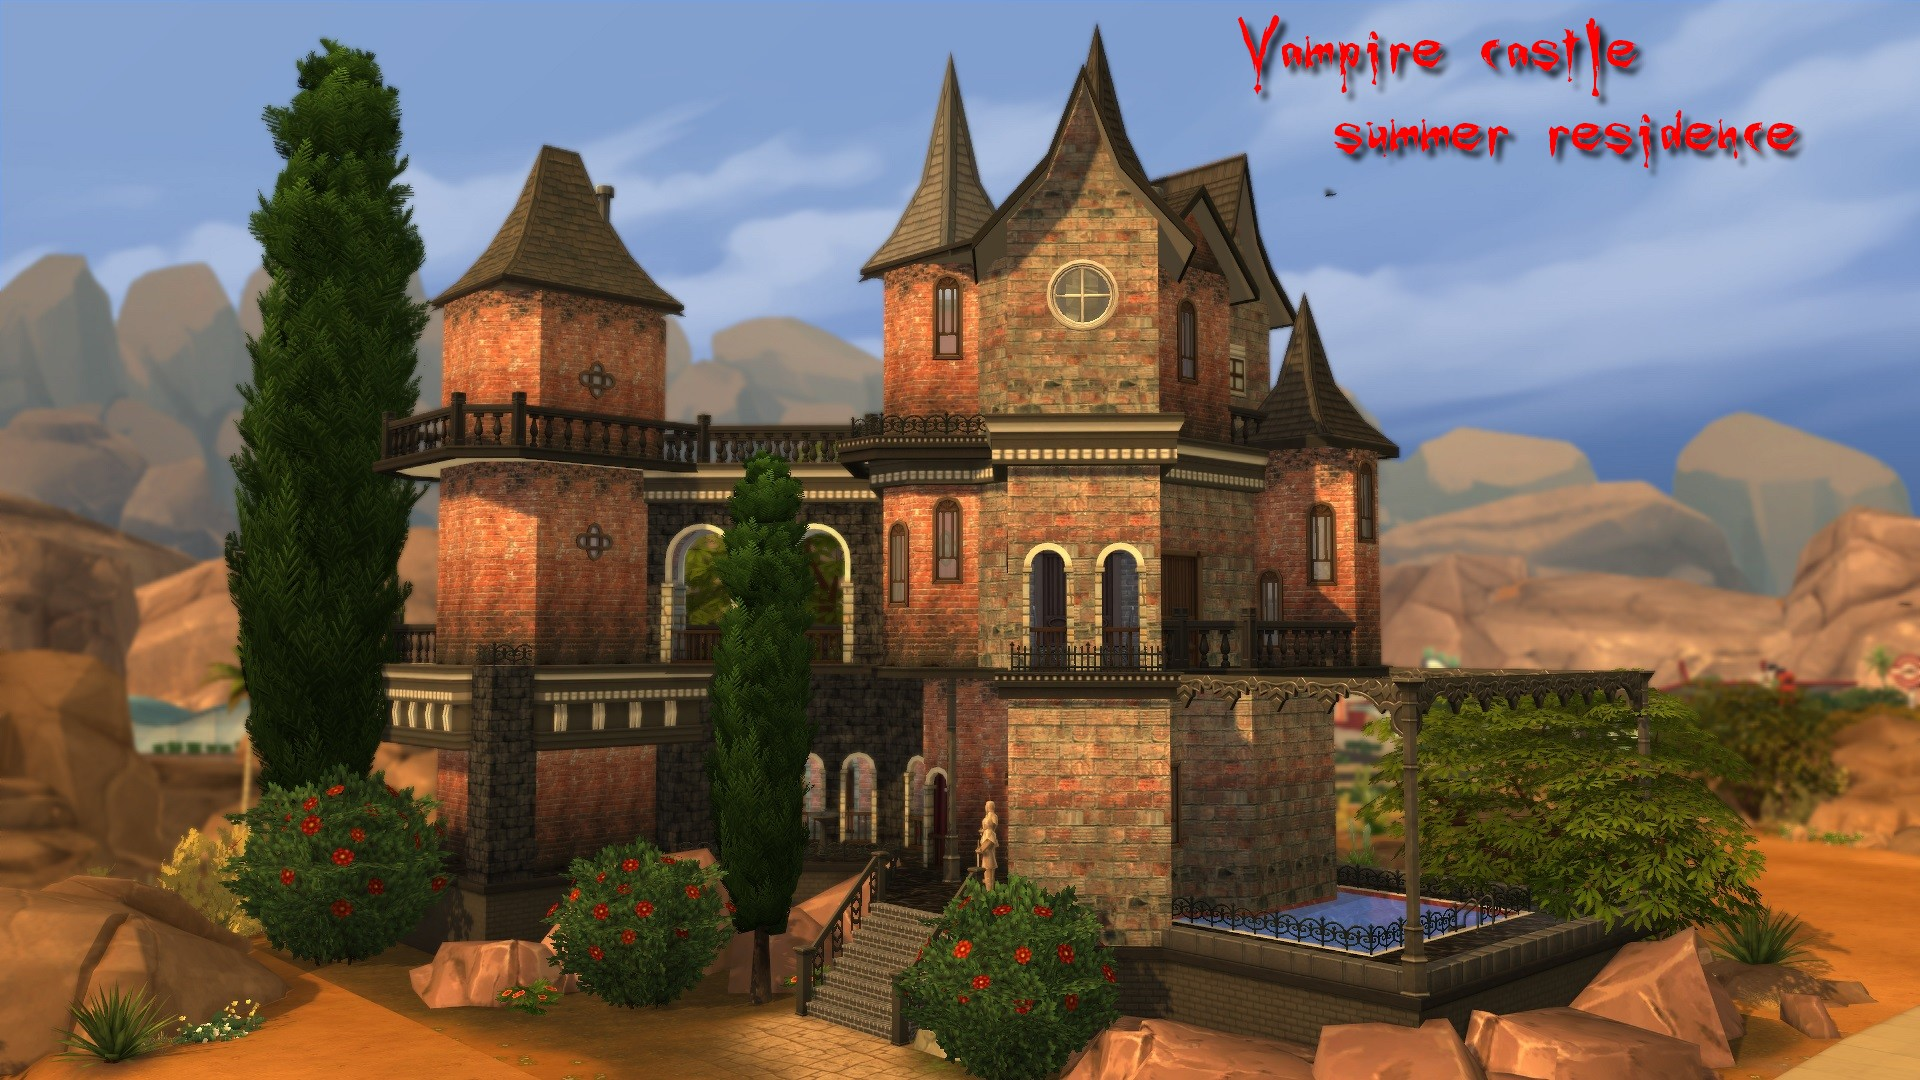 Hogwarts Dining Room Mod The Sims Vampire Castle Summer Residence